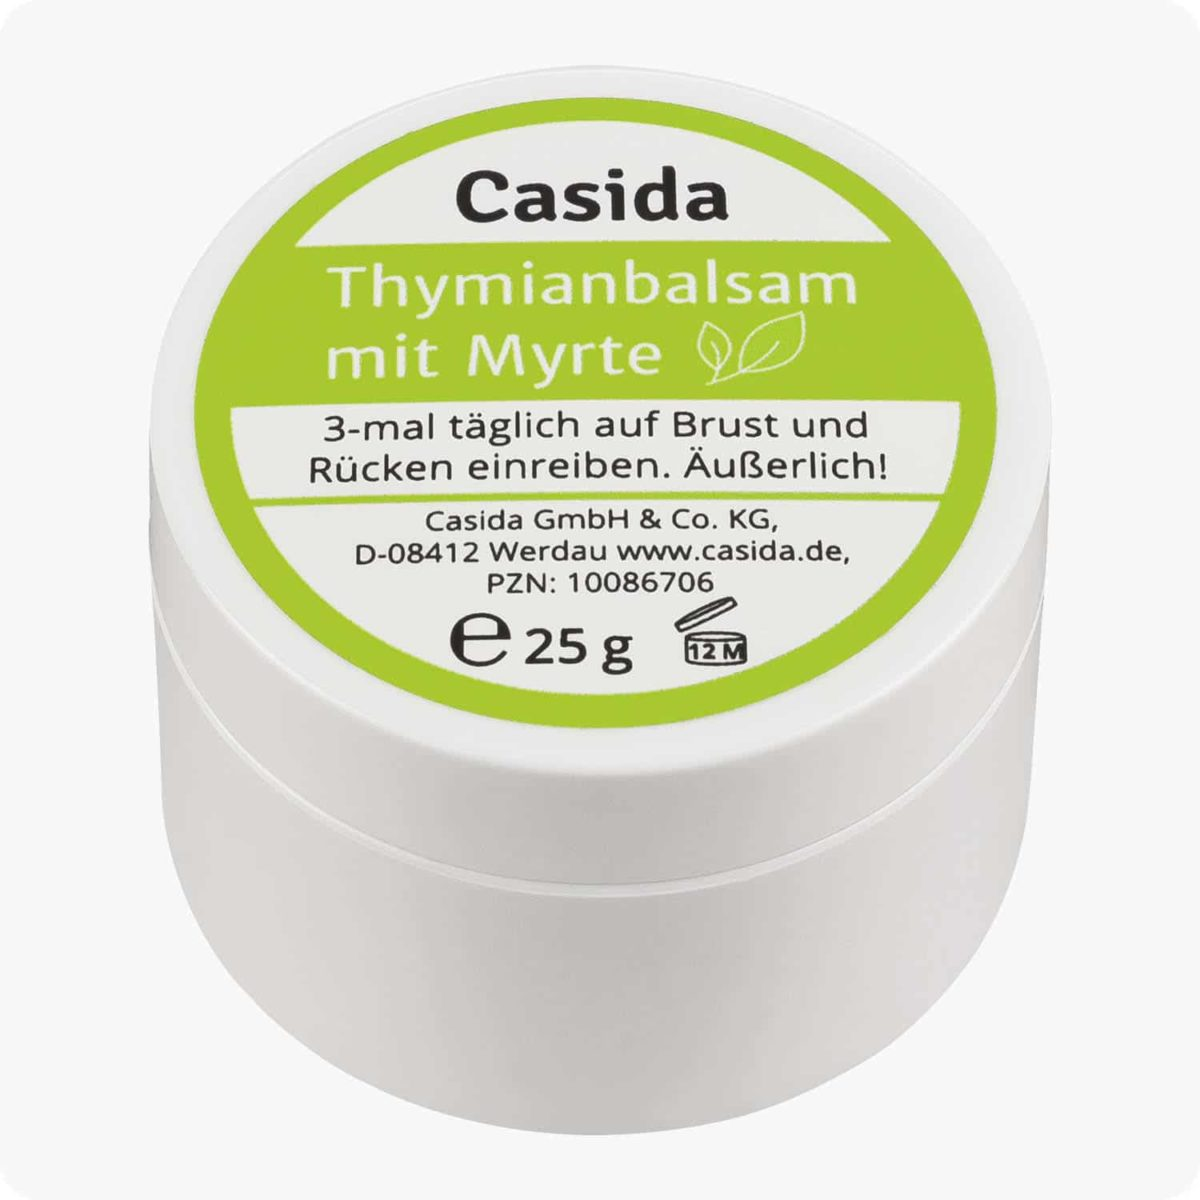 Casida Thyme Balm with Myrtle for Adults 25 g 10086706 PZN Apotheke Erkältungsbalsam husten